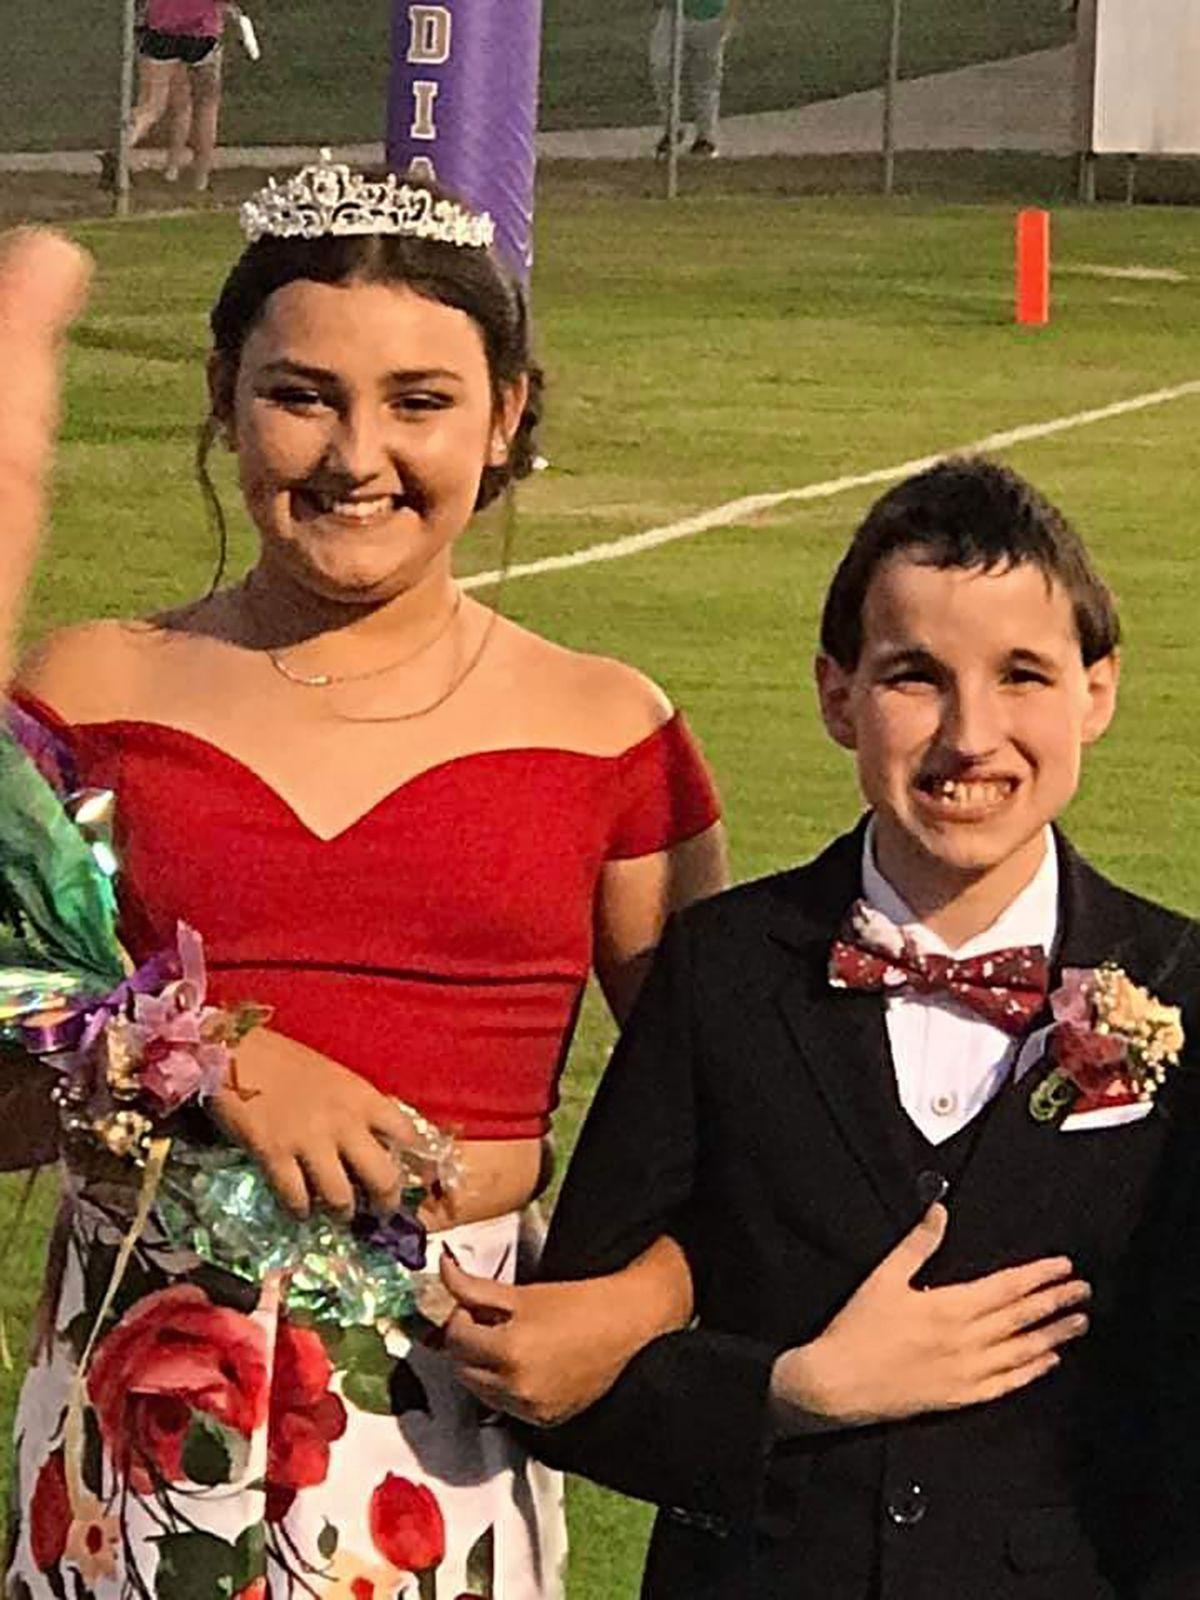 Gracie Johnson and Matthew Hart